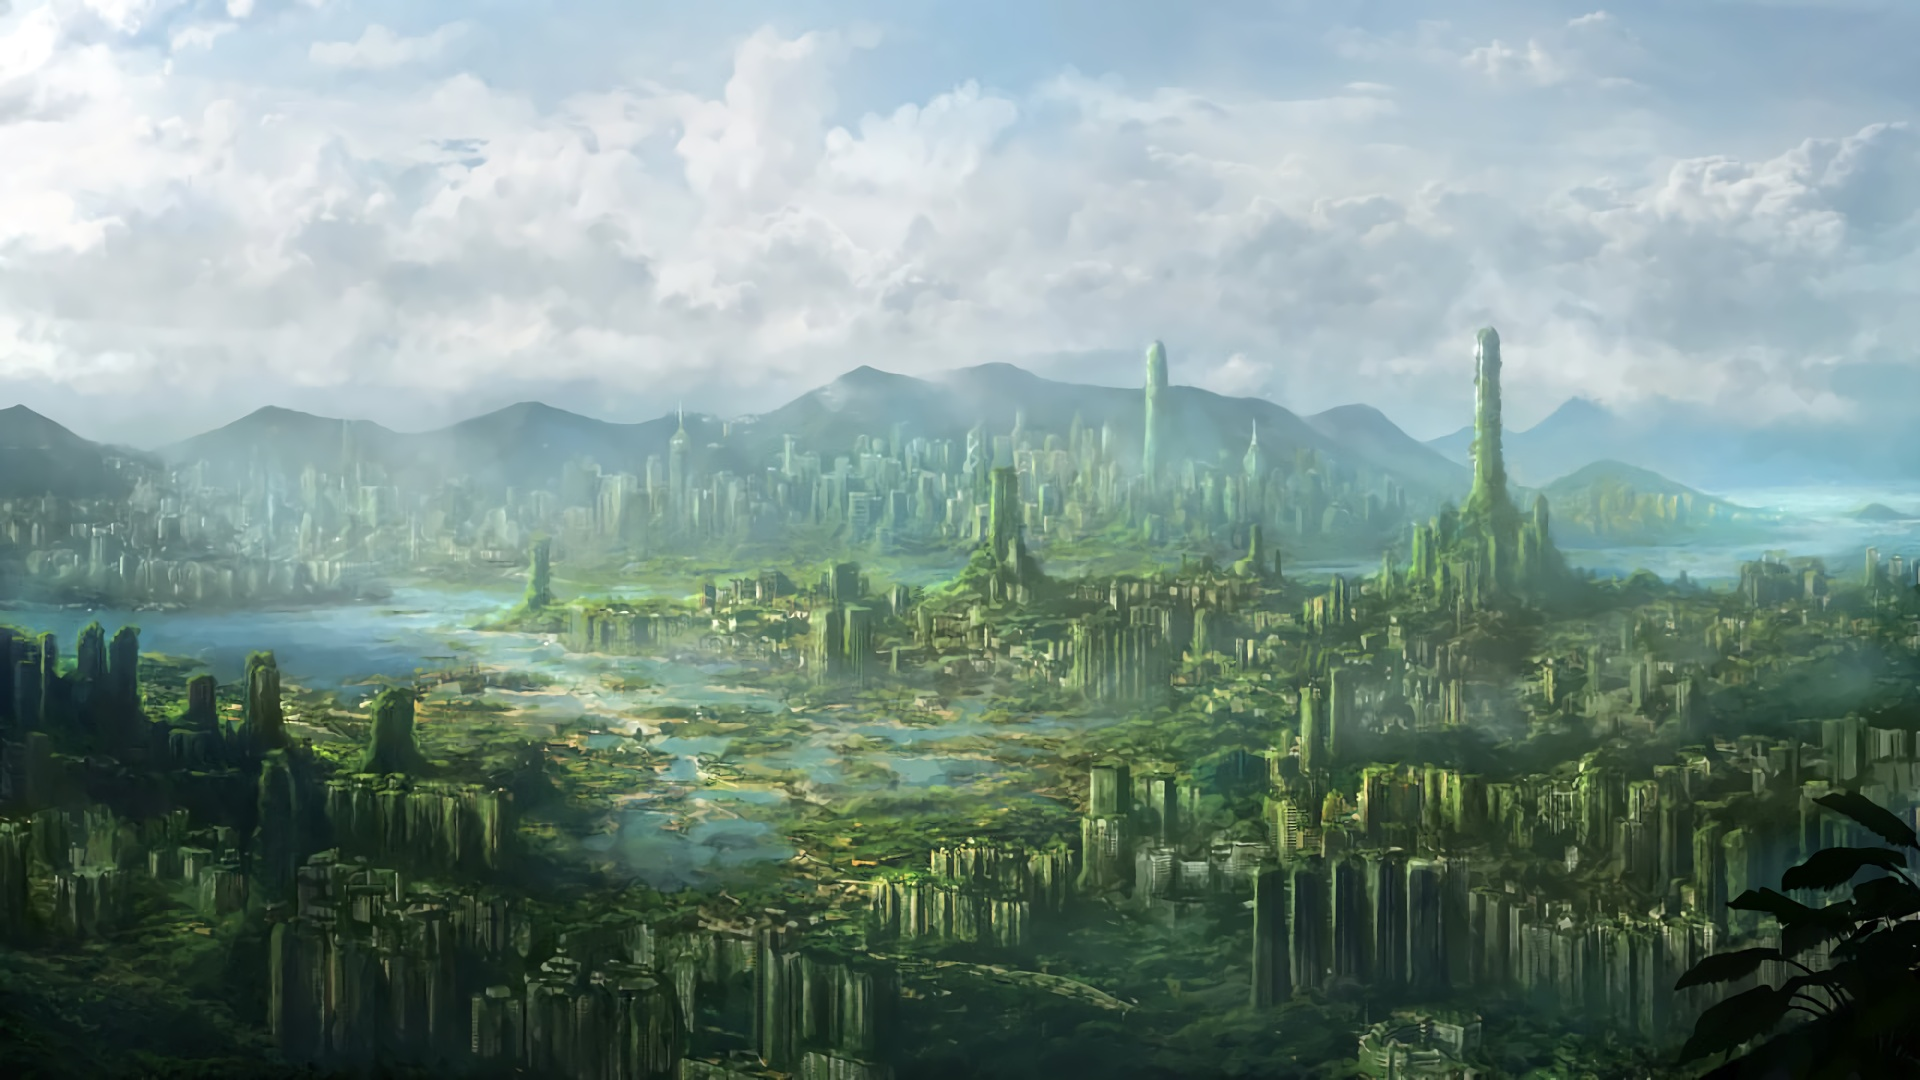 Post Apocalyptic Overgrown City computer background